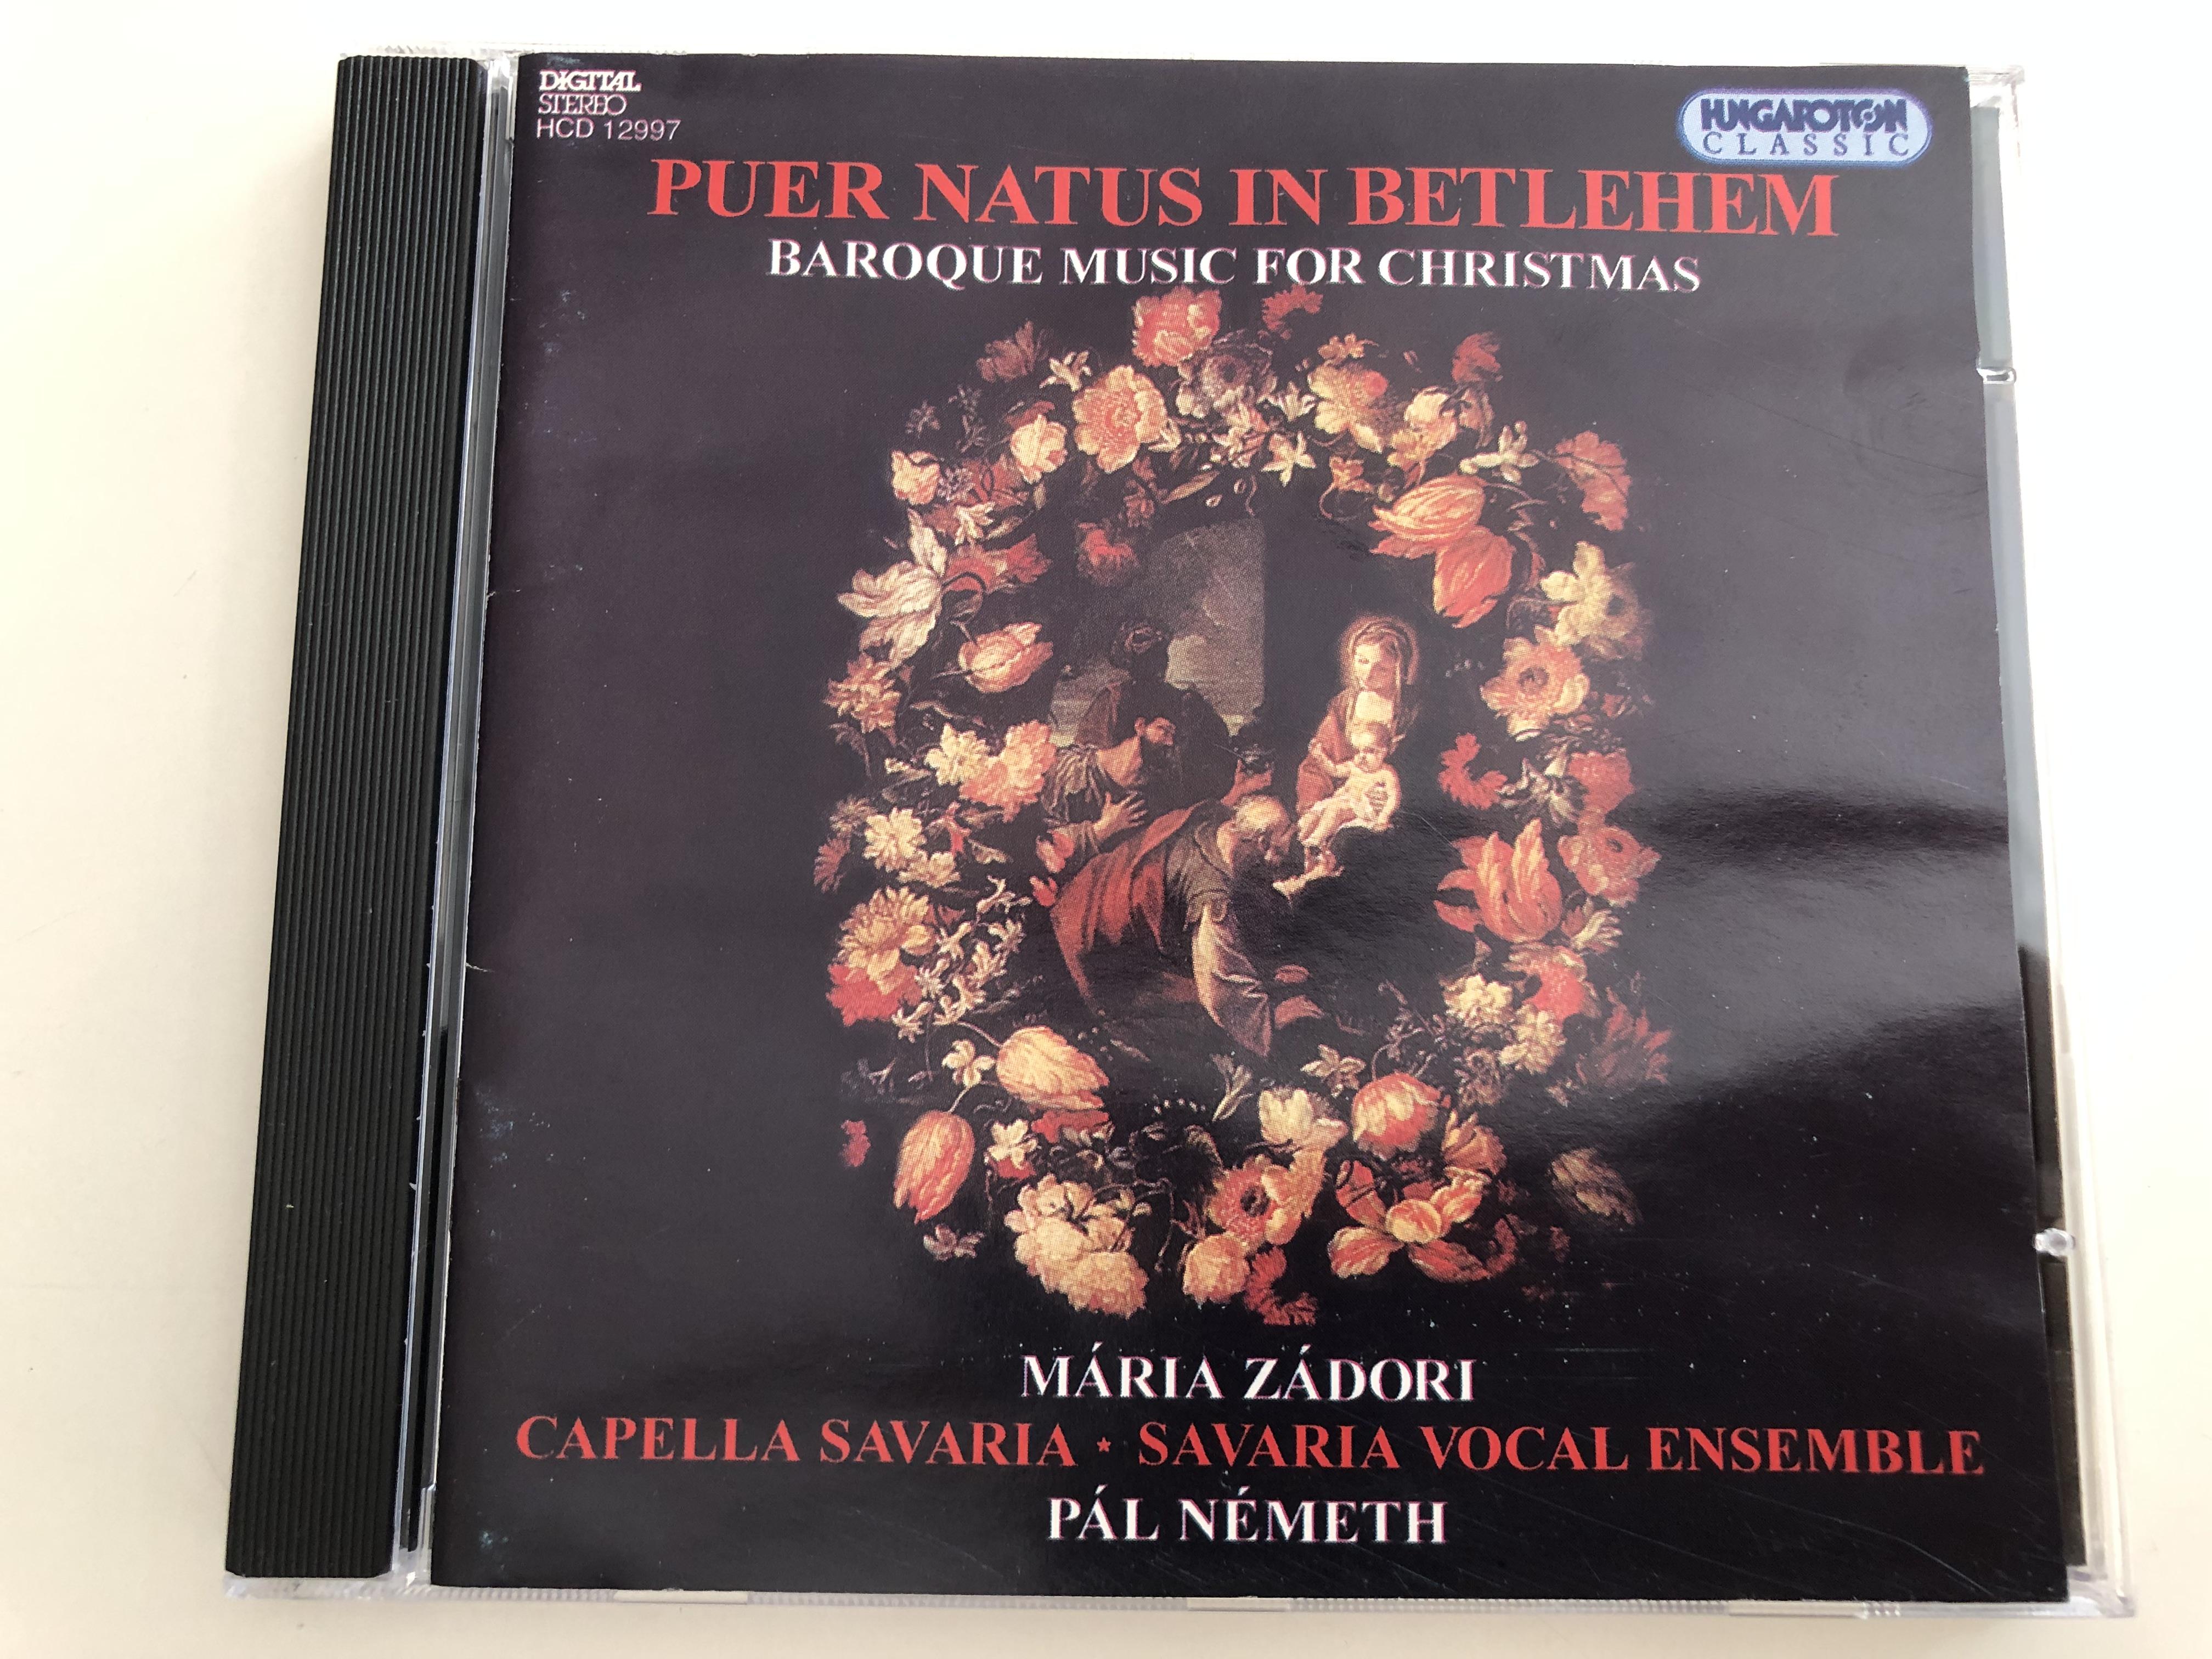 puer-natus-in-betlehem-baroque-music-for-christmas-m-ria-z-dori-capella-savaria-savaria-vocal-ensemble-conducted-by-p-l-n-meth-hungaroton-classic-audio-cd-1994-hcd-12997-1-.jpg